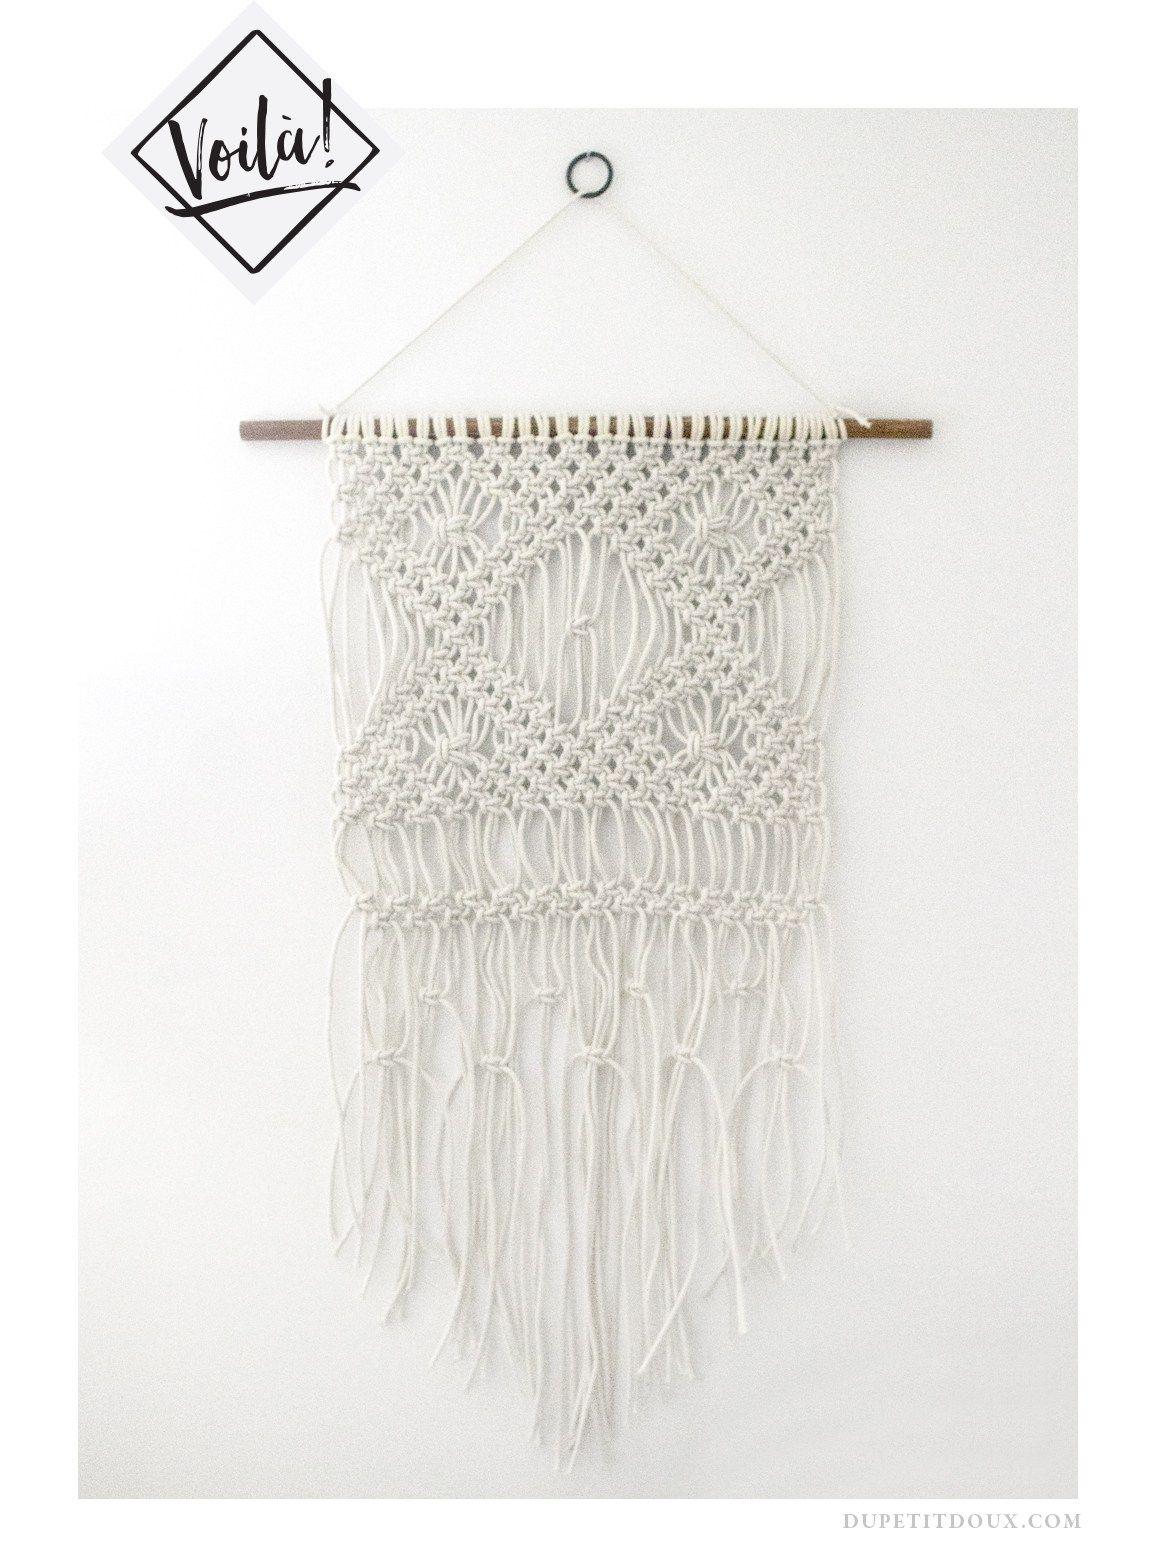 macrame wall hanging tutorial diy knots dupetitdoux. Black Bedroom Furniture Sets. Home Design Ideas